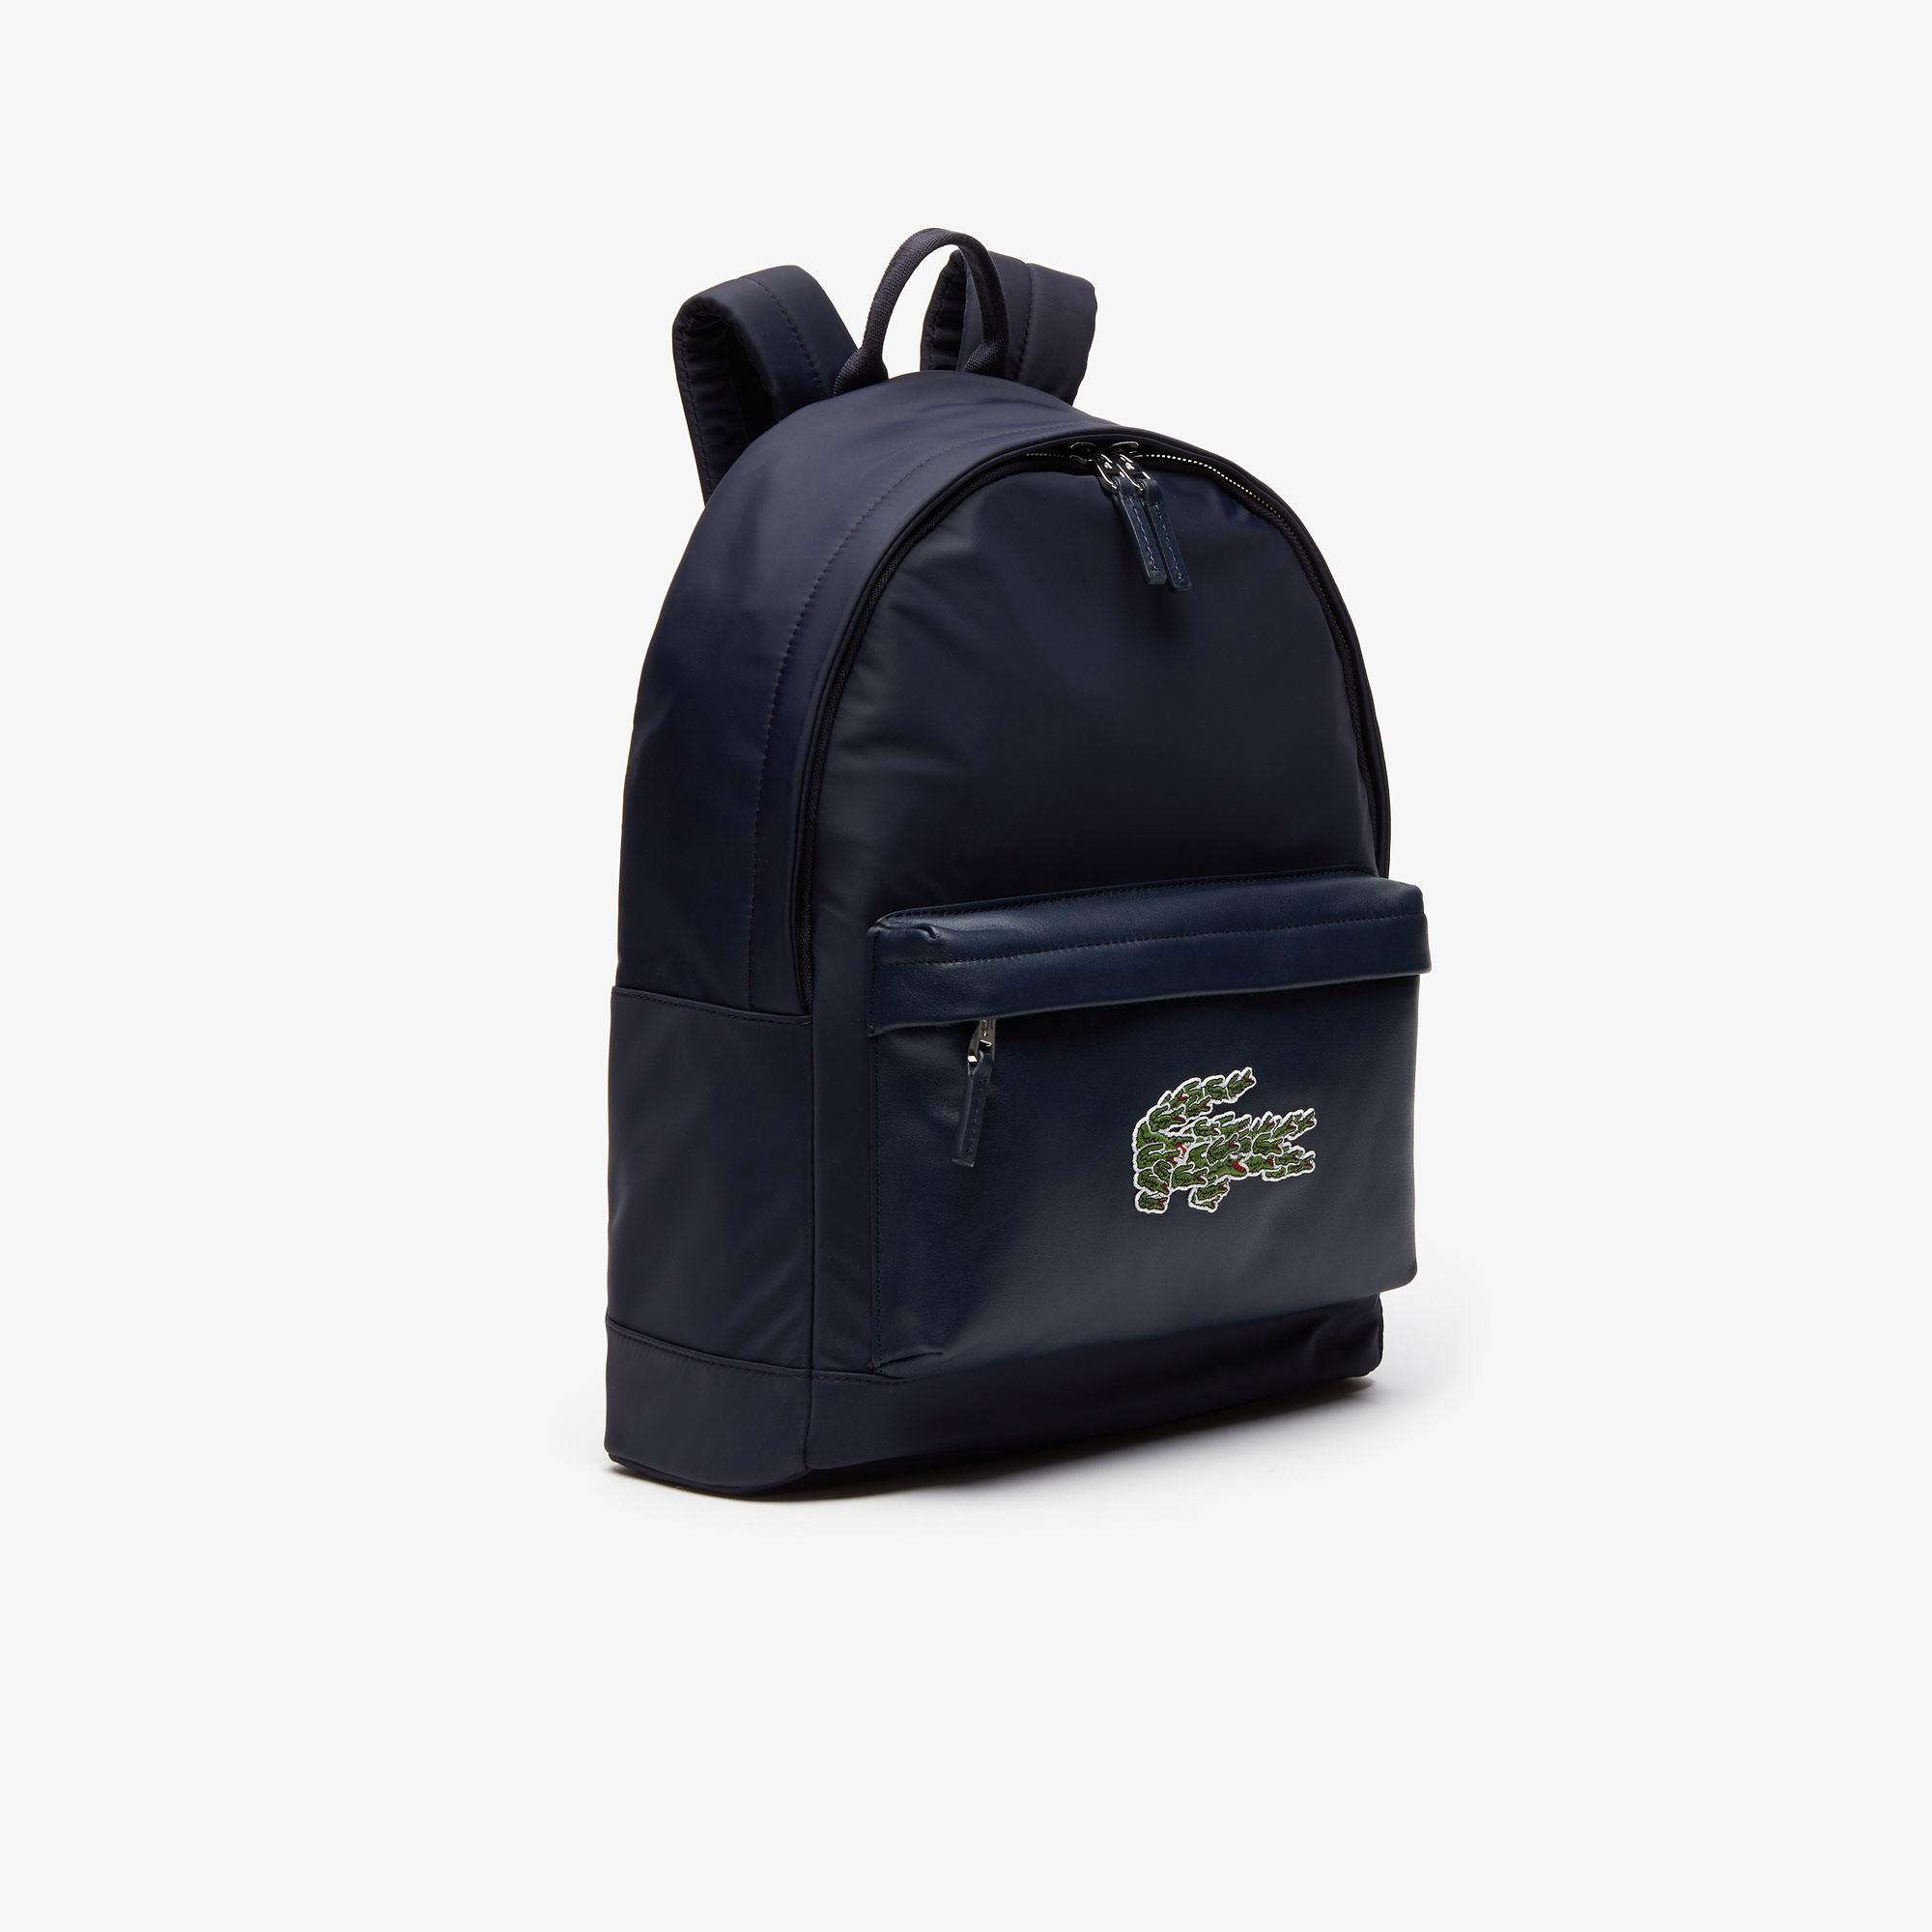 Lacoste рюкзак чоловічий L.12.12 Croco Magic